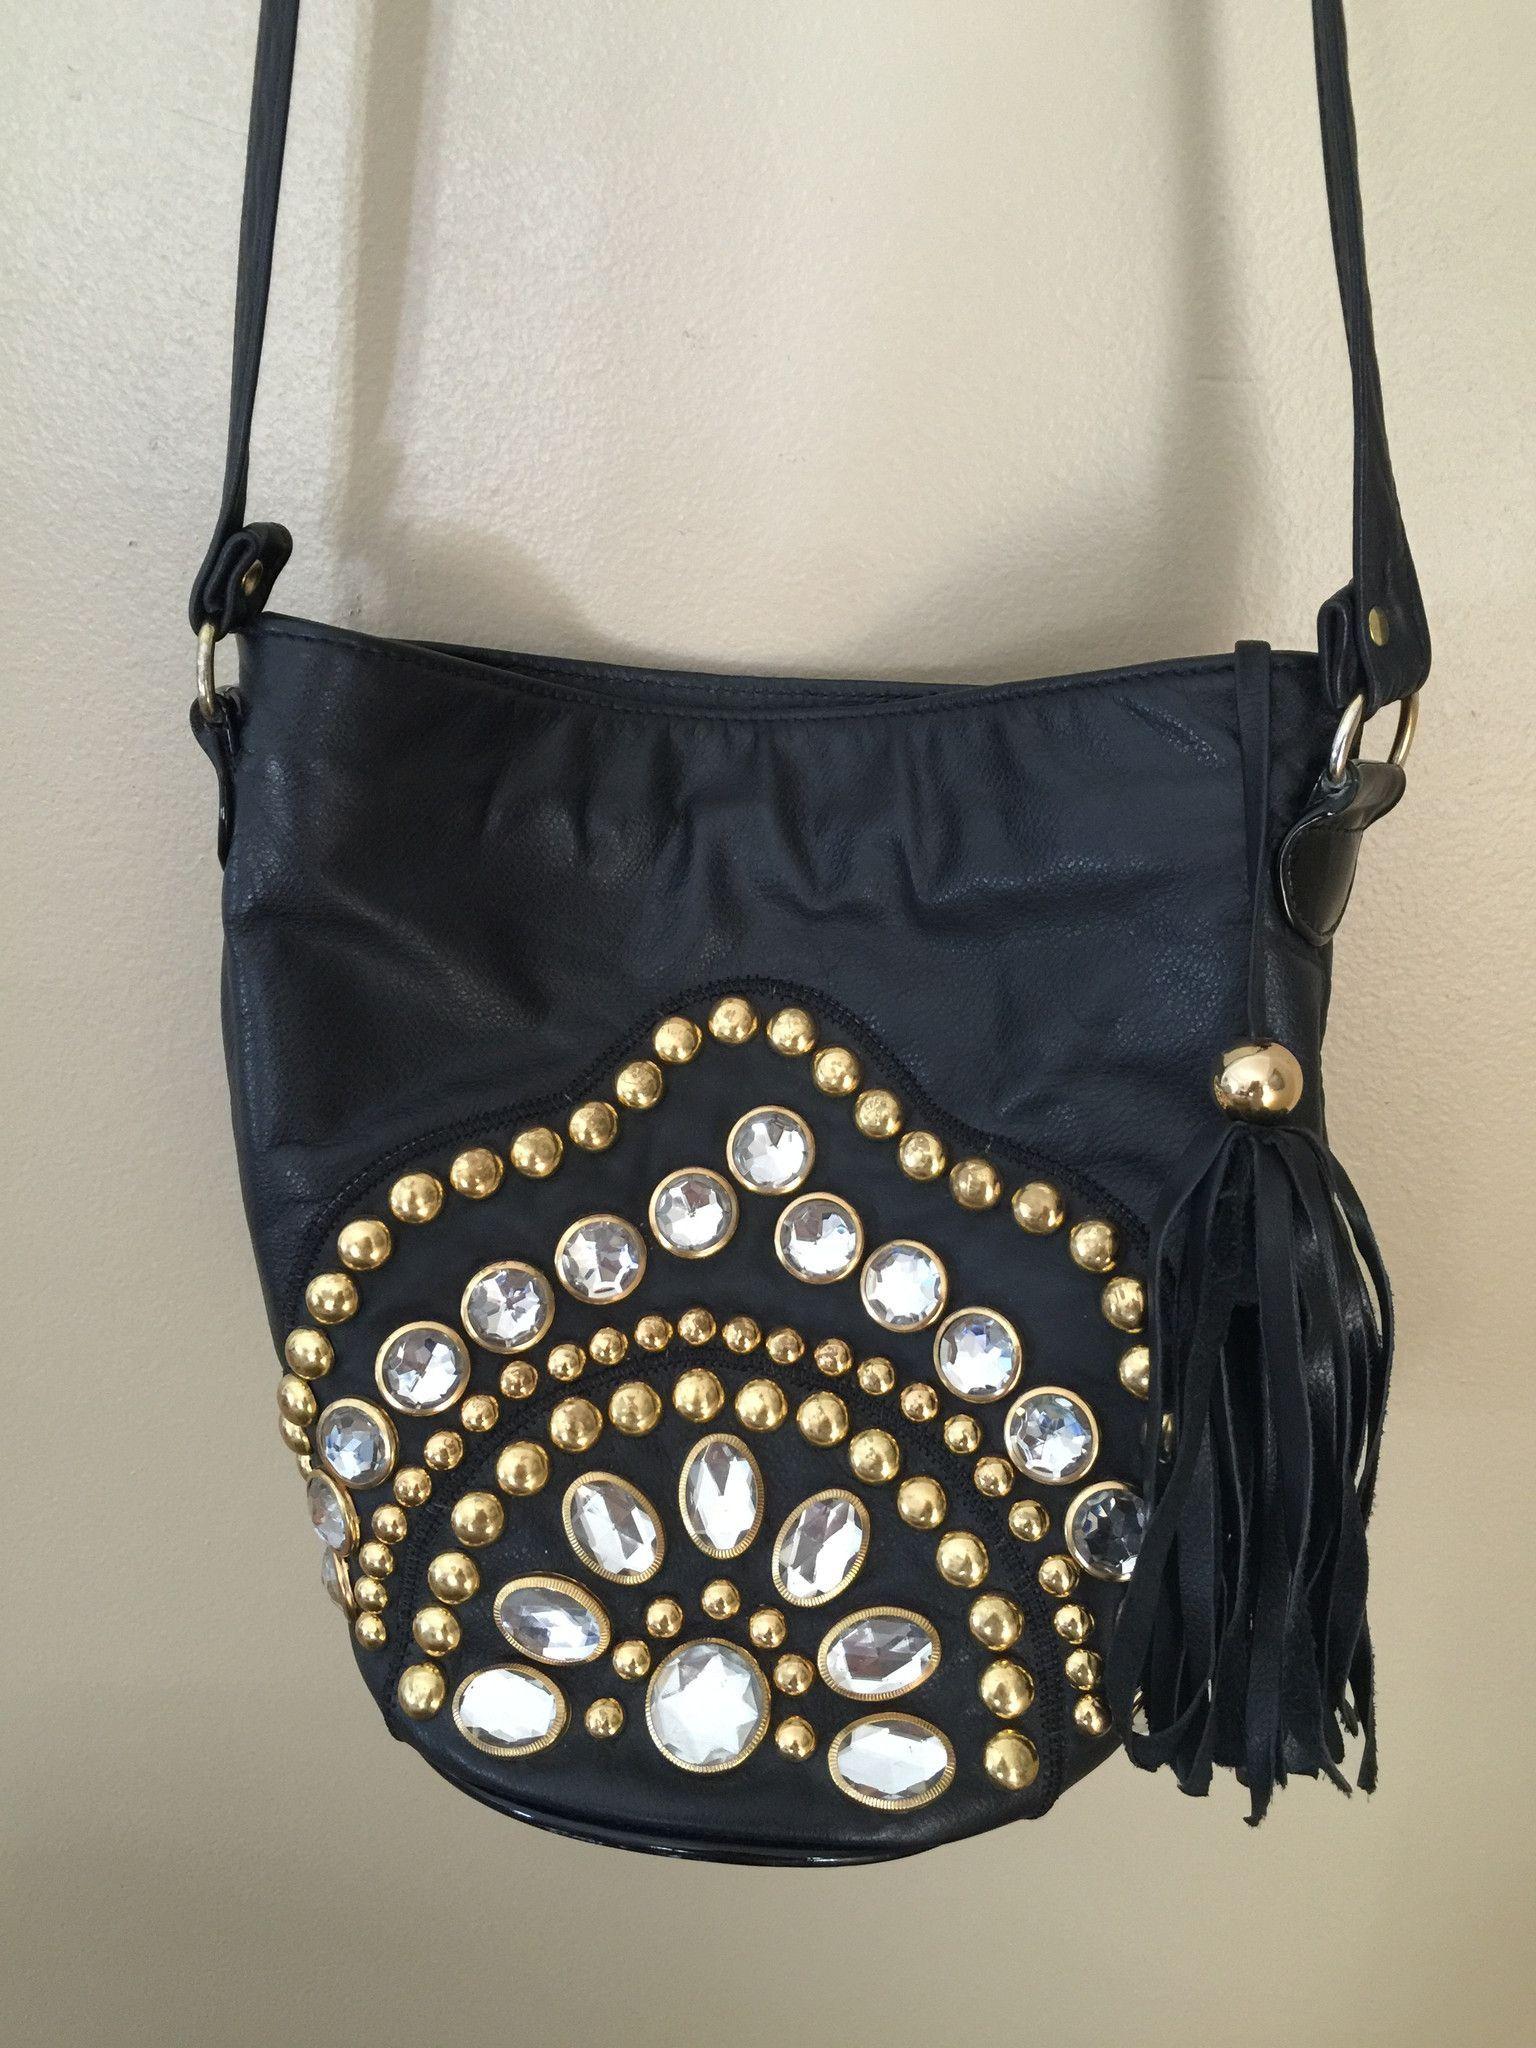 Paul Joseph Leather Bags